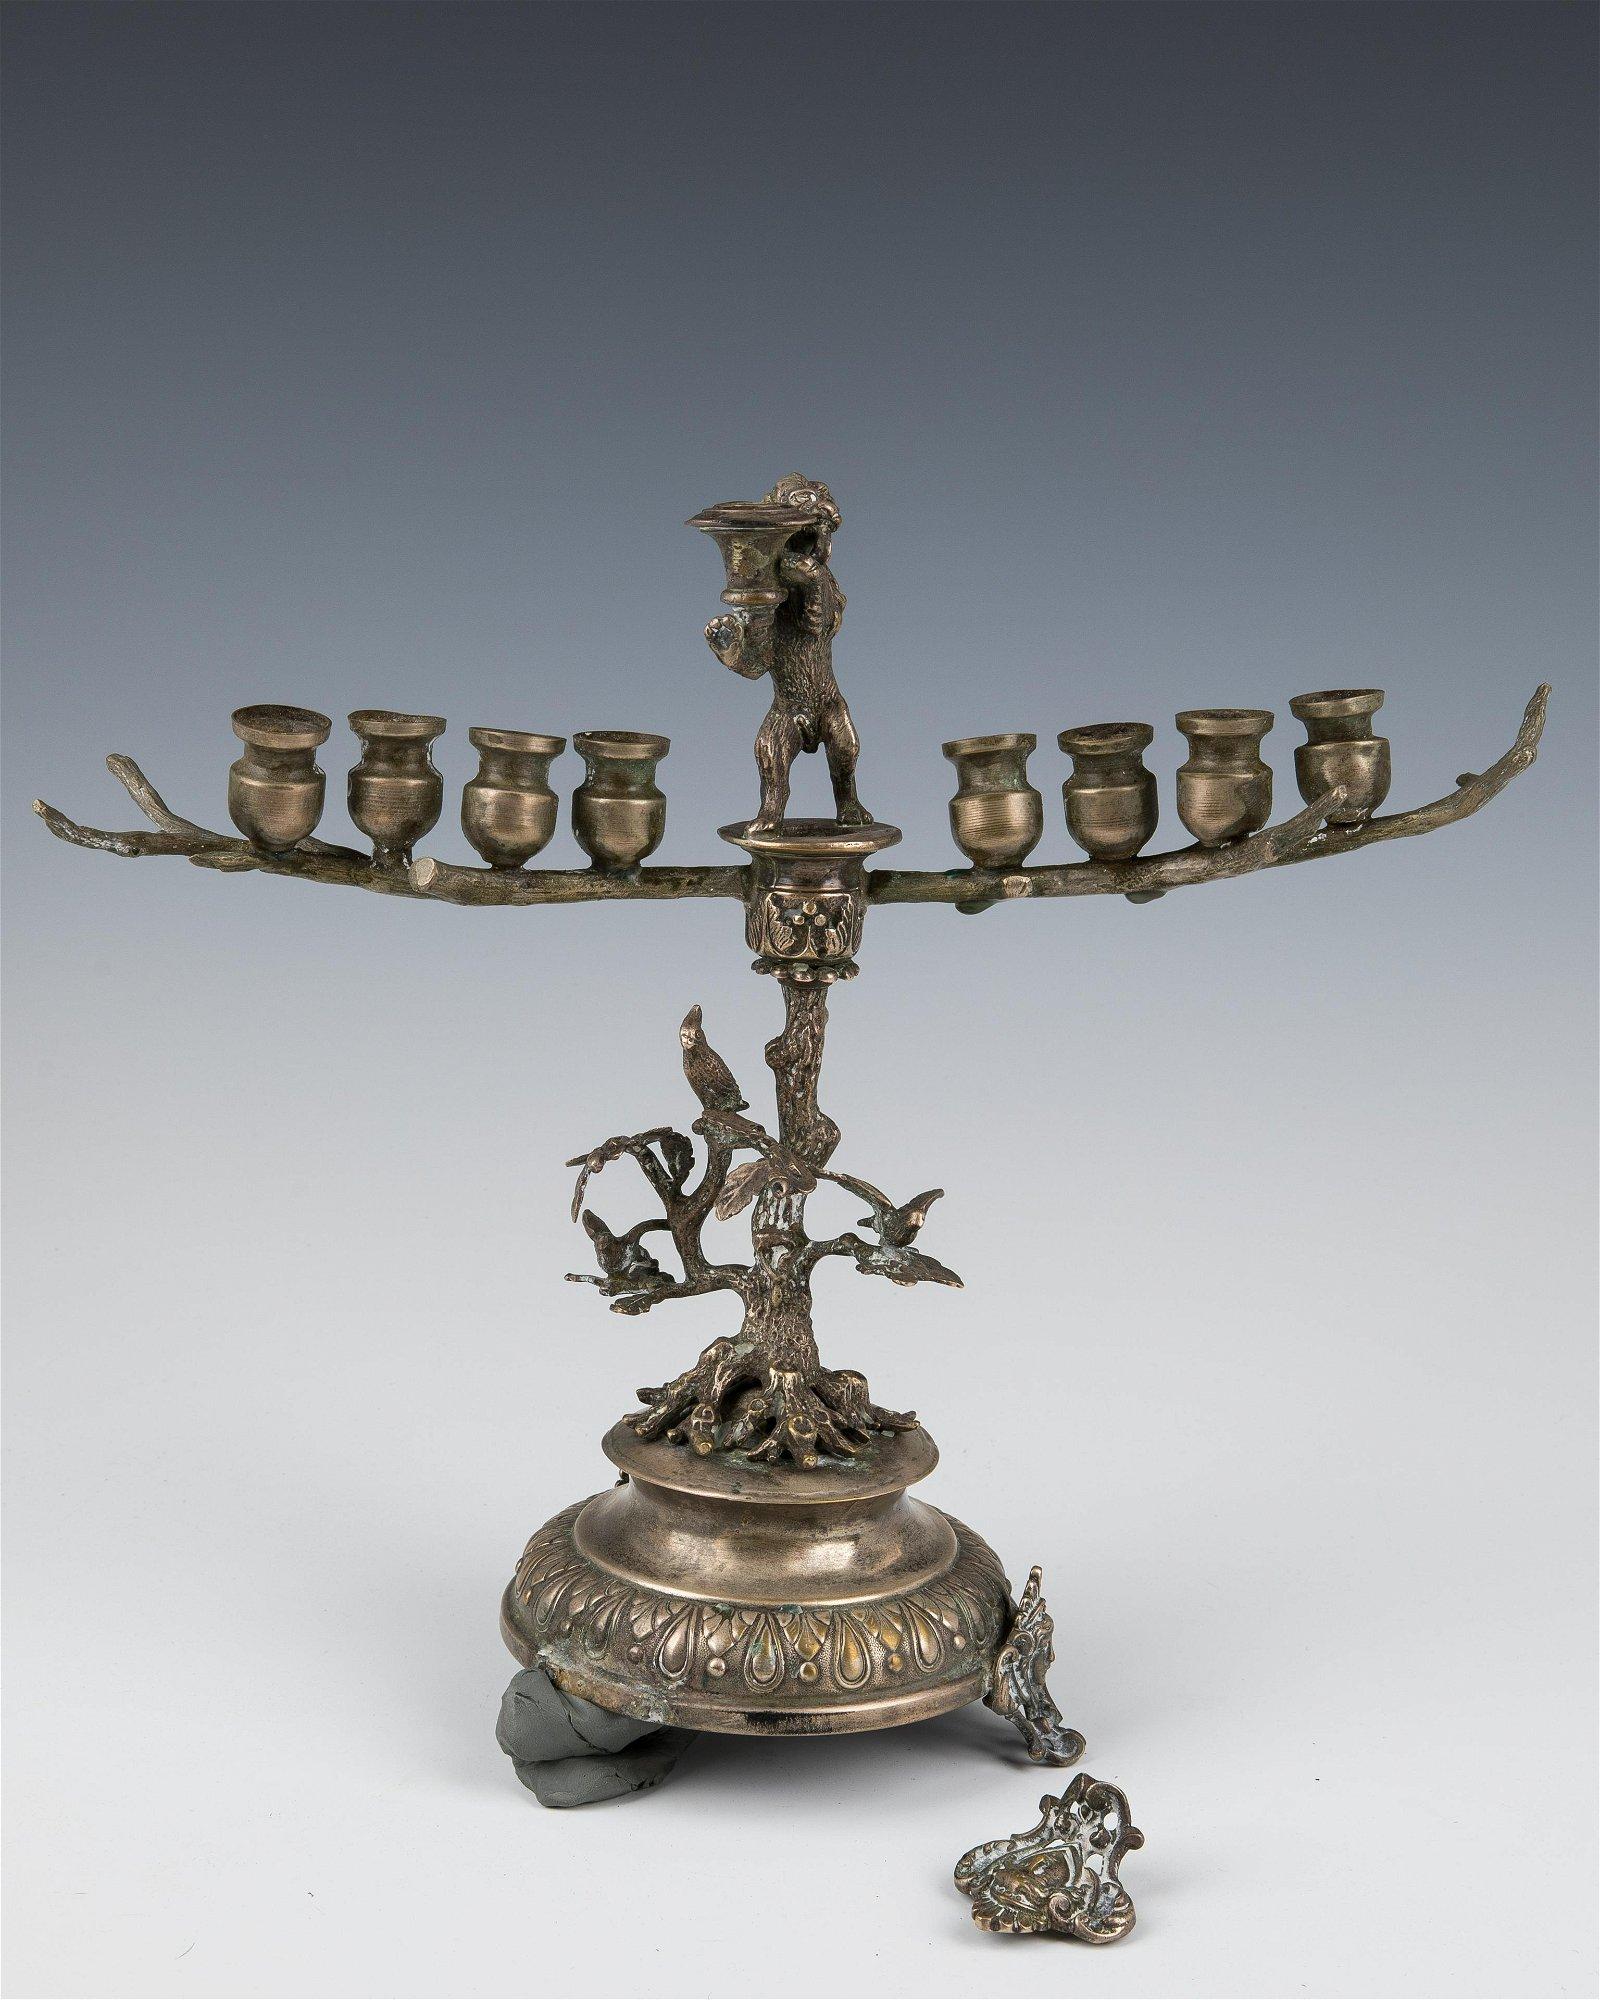 A TREE OF LIFE MENORAH. Probably Europe, 20th century